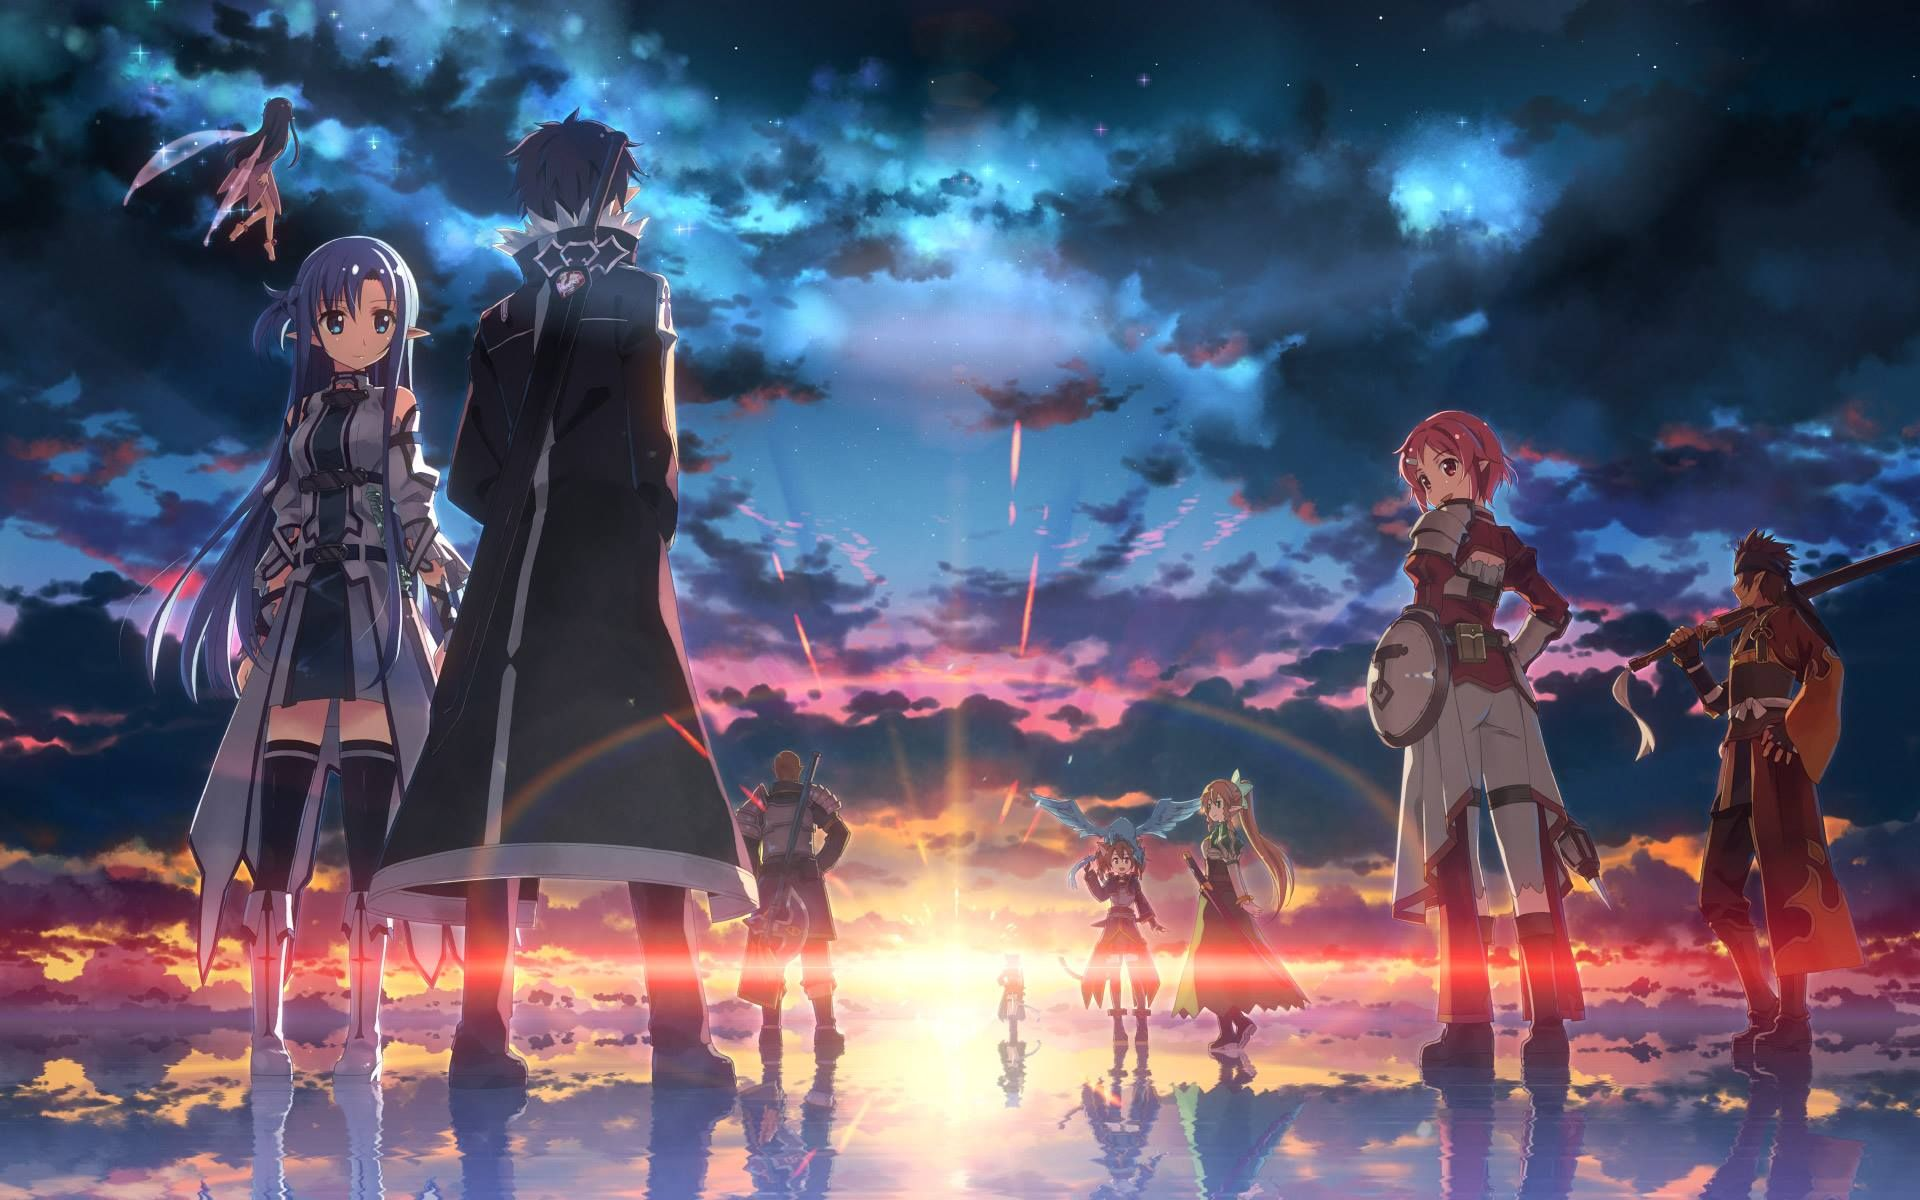 Sword Art Online Copyright Artist Source Pixiv アニメイラスト アニメの風景 ソードアートオンライン